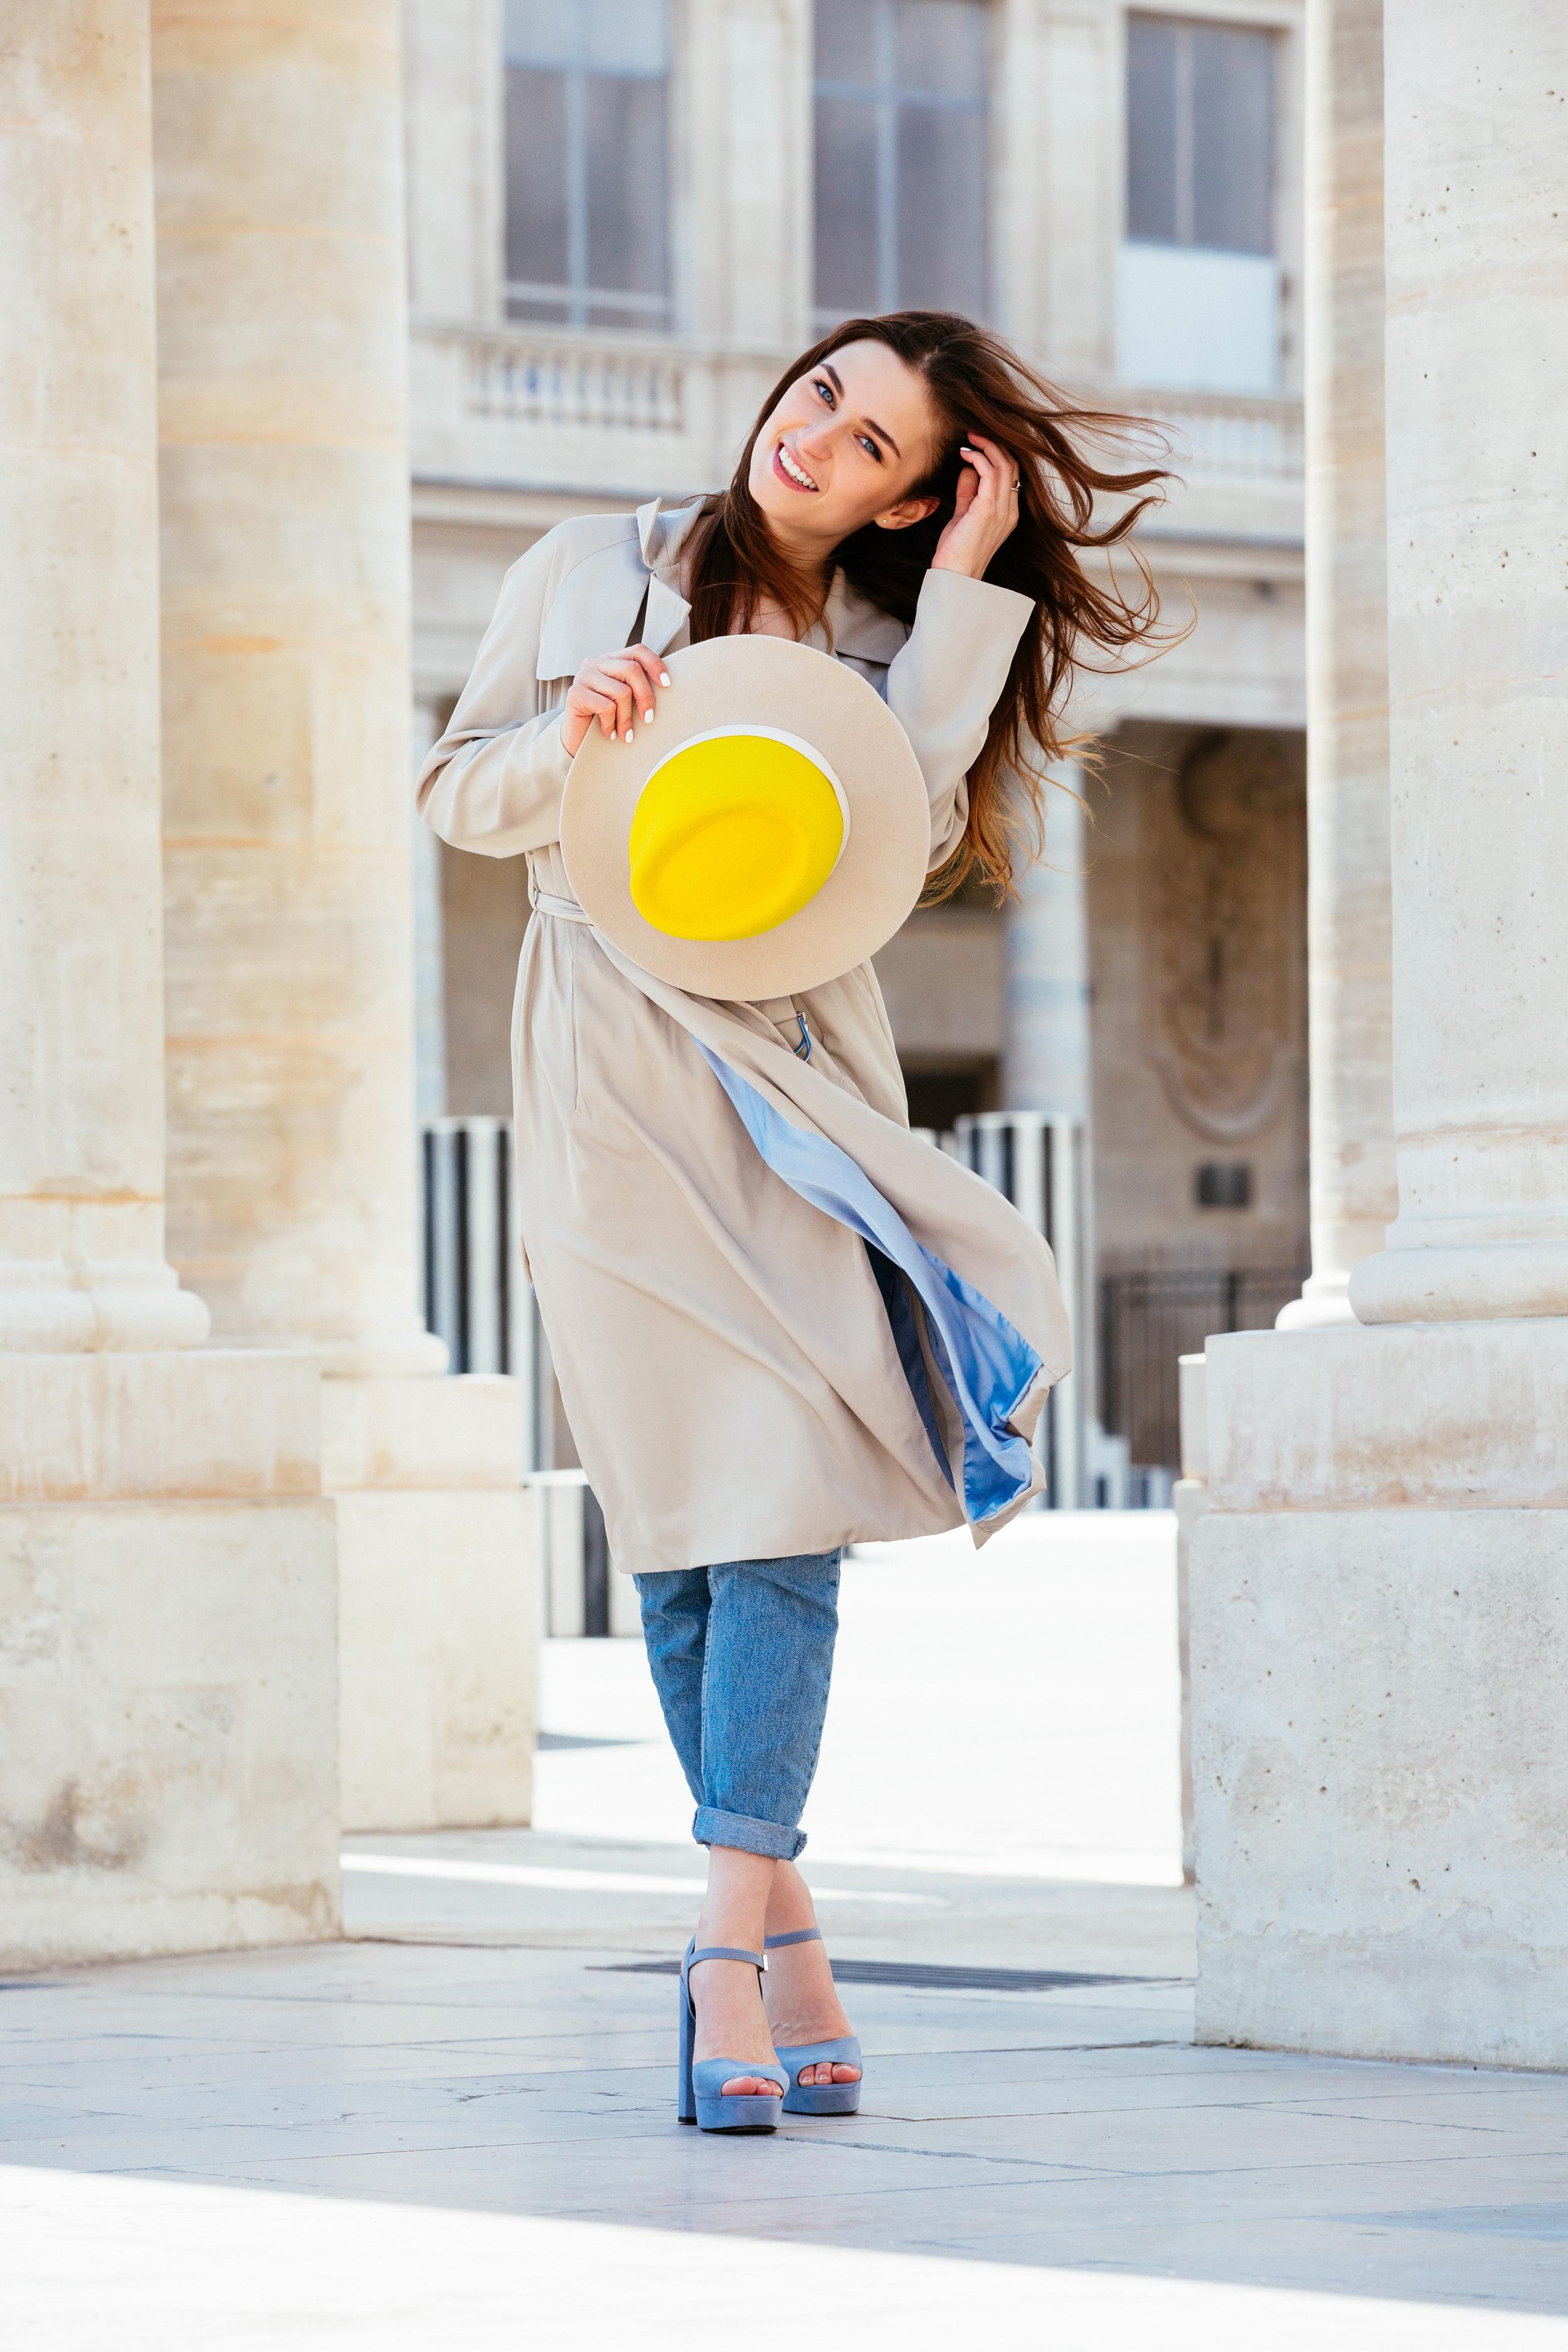 Paris Photographer Palais Royal Brand Lookbook Iheartparisfr